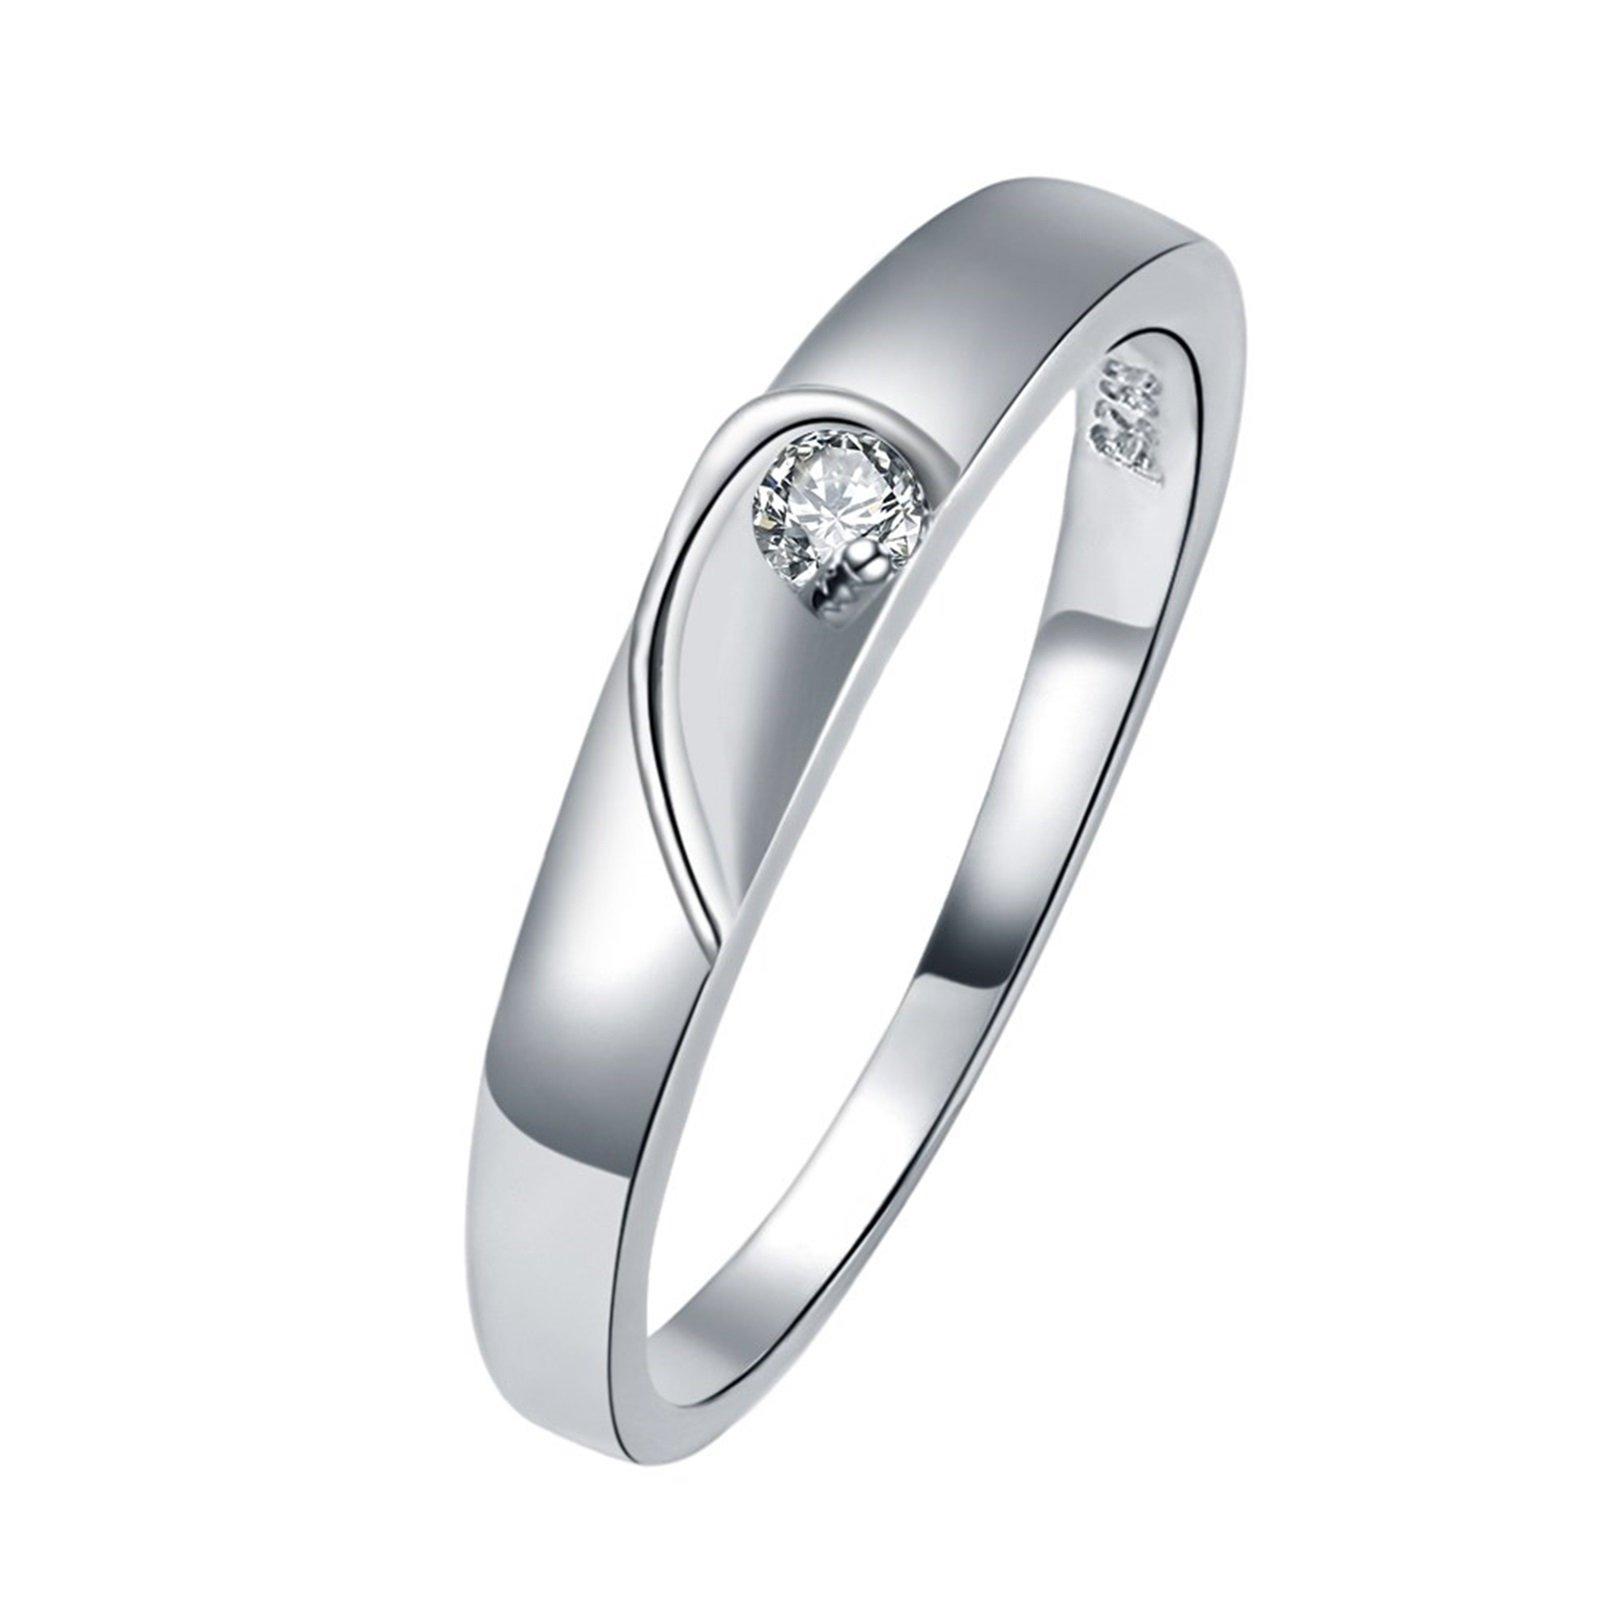 Epinki Silver Ring, Women's Wedding Bands White Cubic Zirconia Half Heart Ring Size 10 Men Accessories